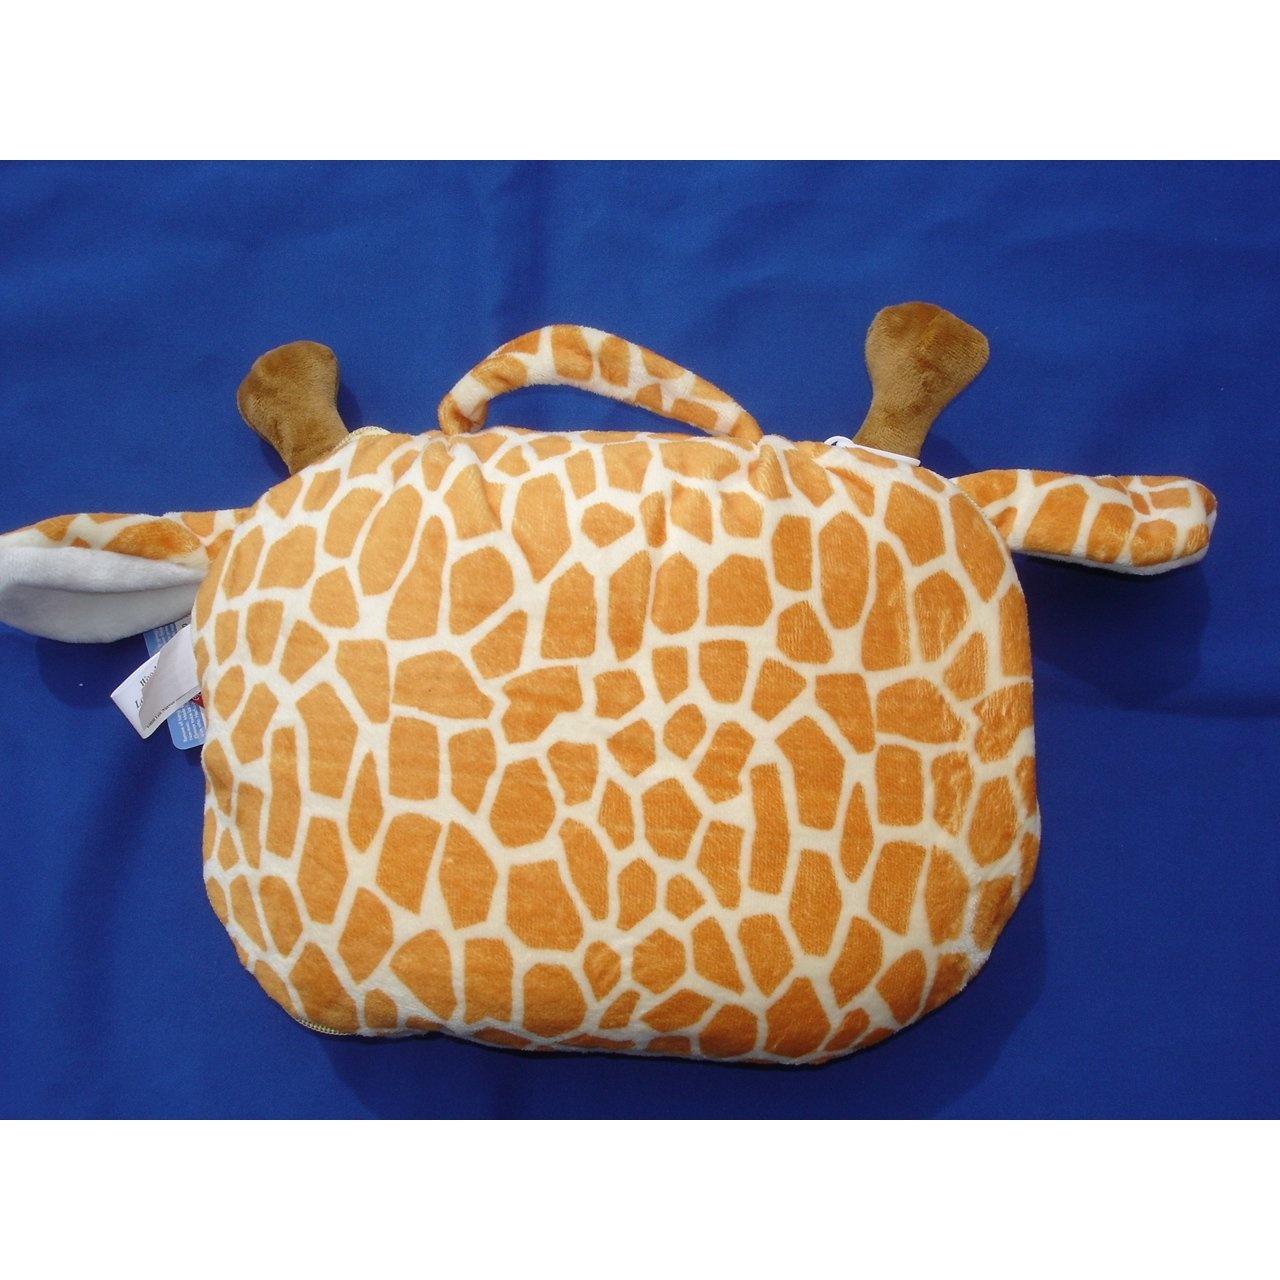 Super Soft Baby 5.1cm 1 Plush Giraffe Pillow Blanket Pet, the Best Baby Companion 11street ...